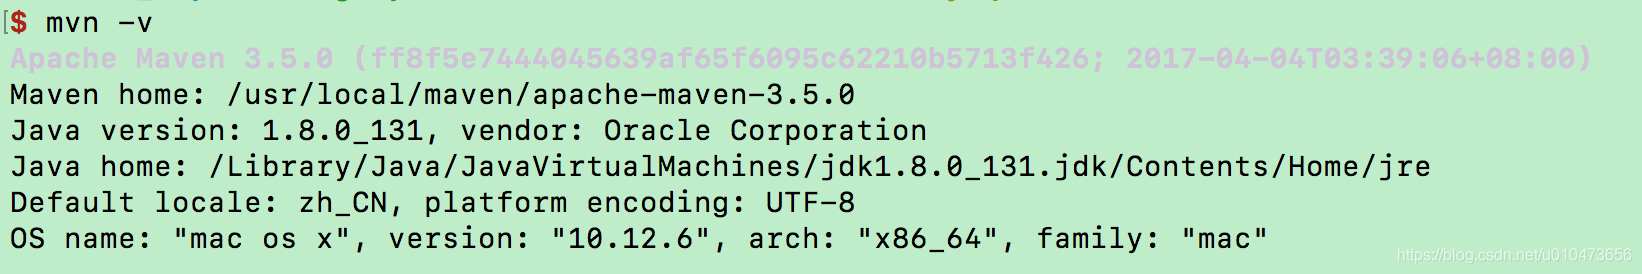 Mac zsh: command not found:mvn - u010473656的专栏- CSDN博客